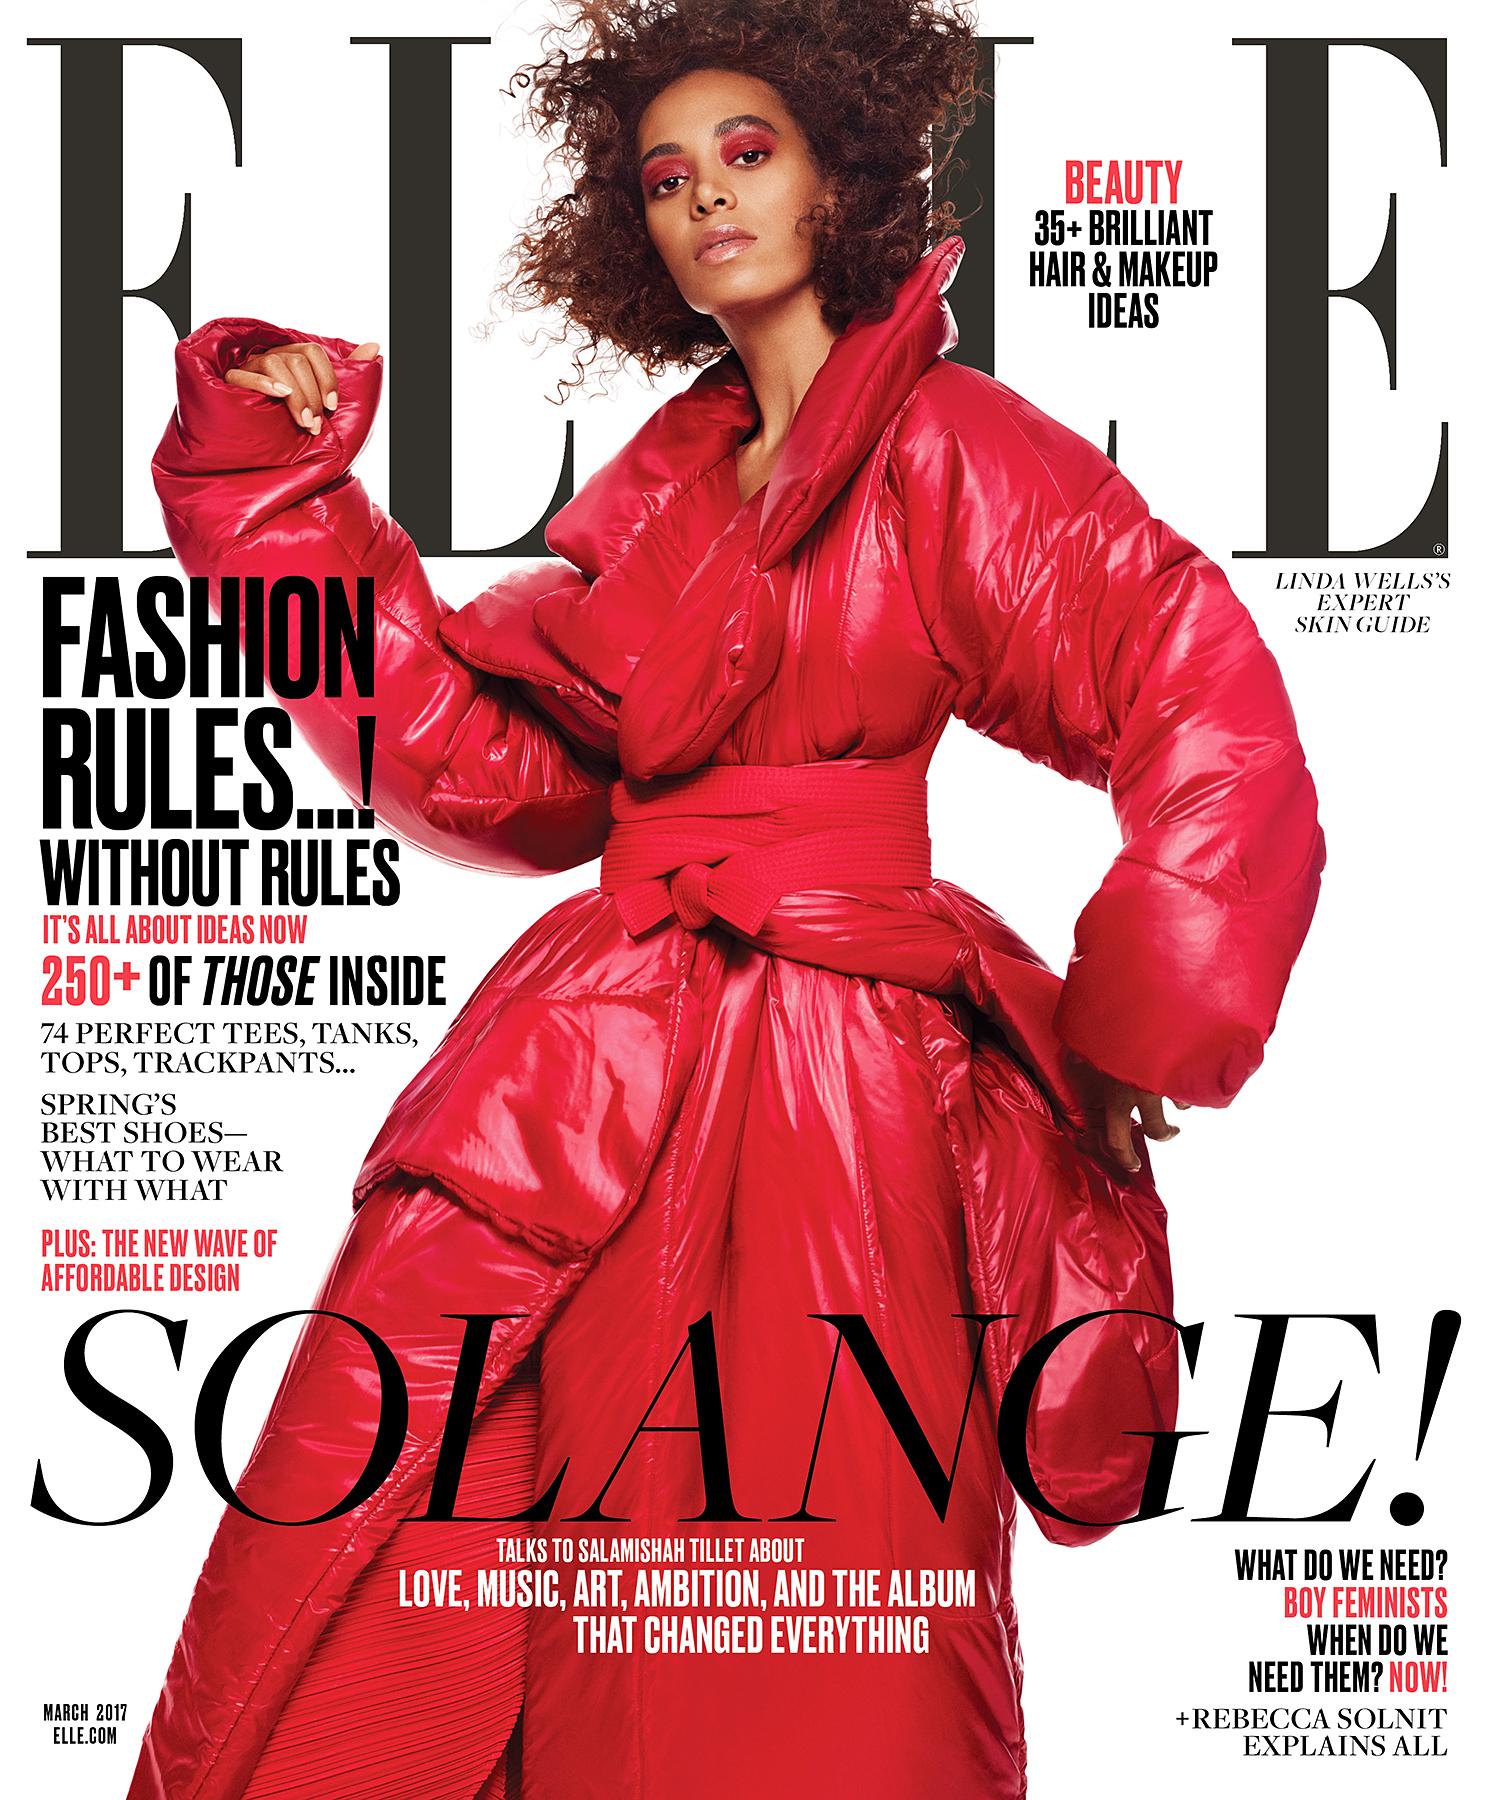 Solange Elle cover